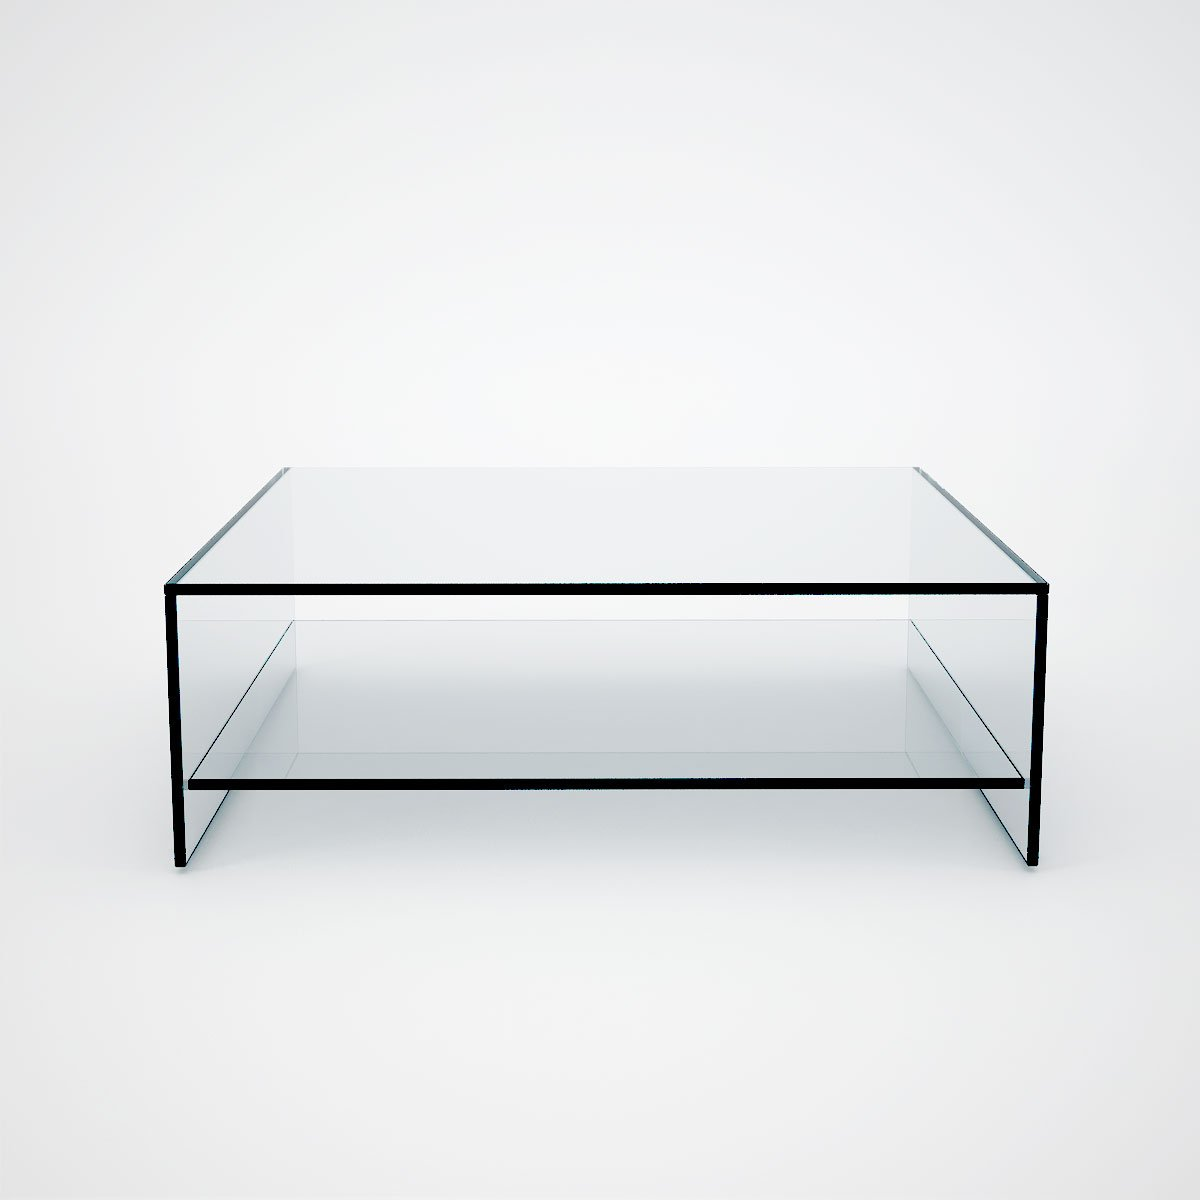 Square Glass Coffee Table Shelf Klarity Glass Furniture